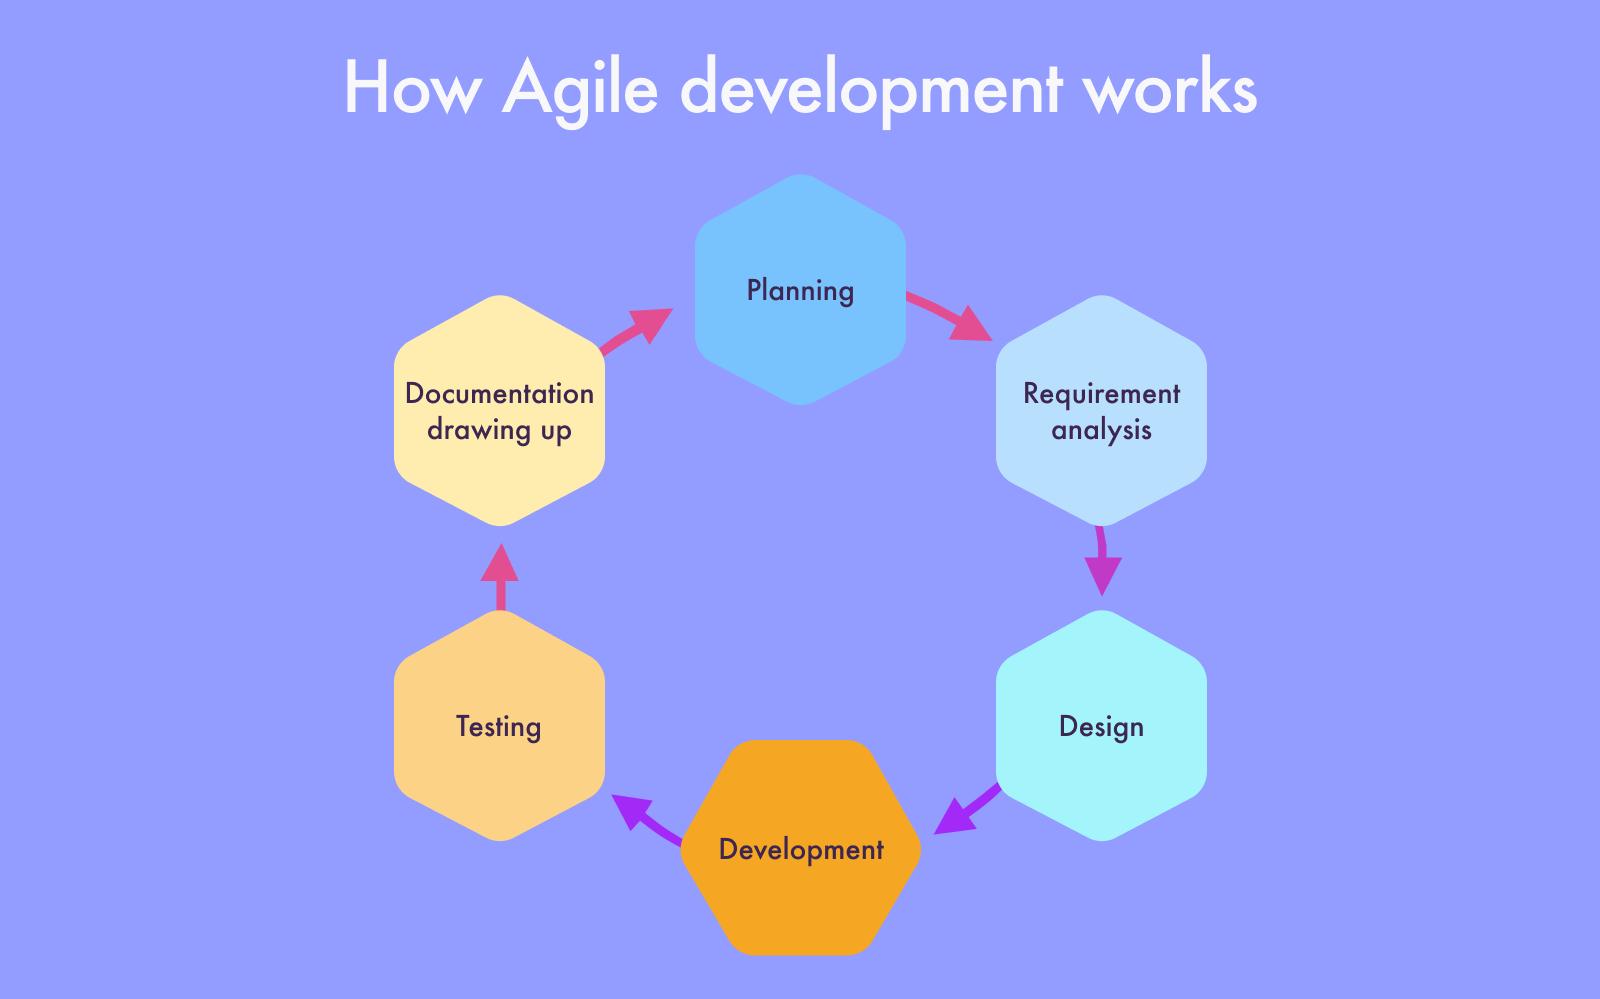 How Agile development works